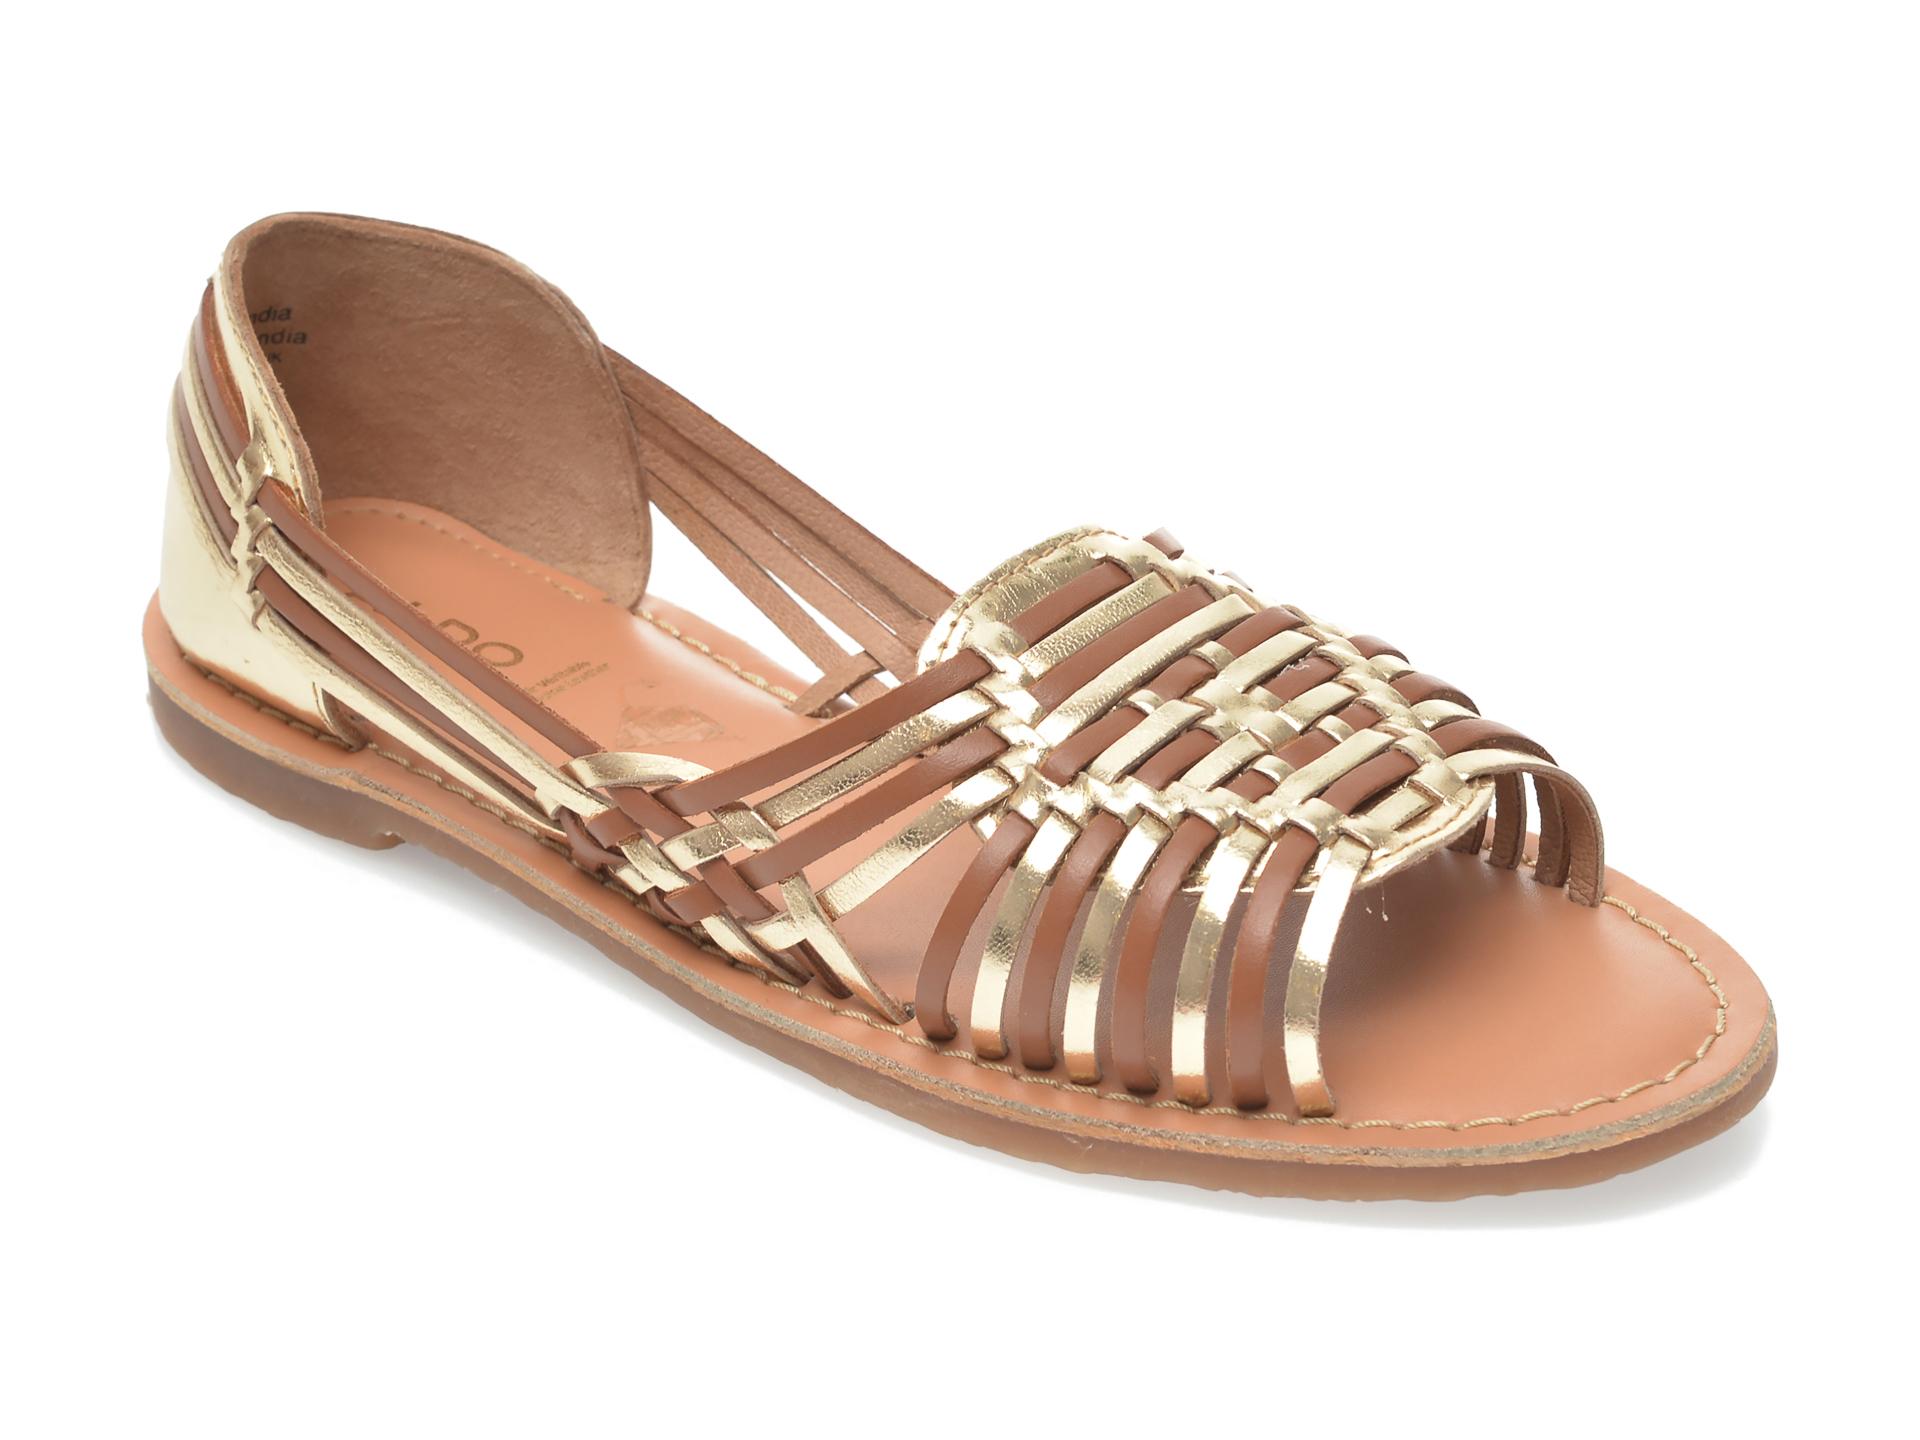 Sandale ALDO aurii, Ariadnee710, din piele naturala imagine otter.ro 2021